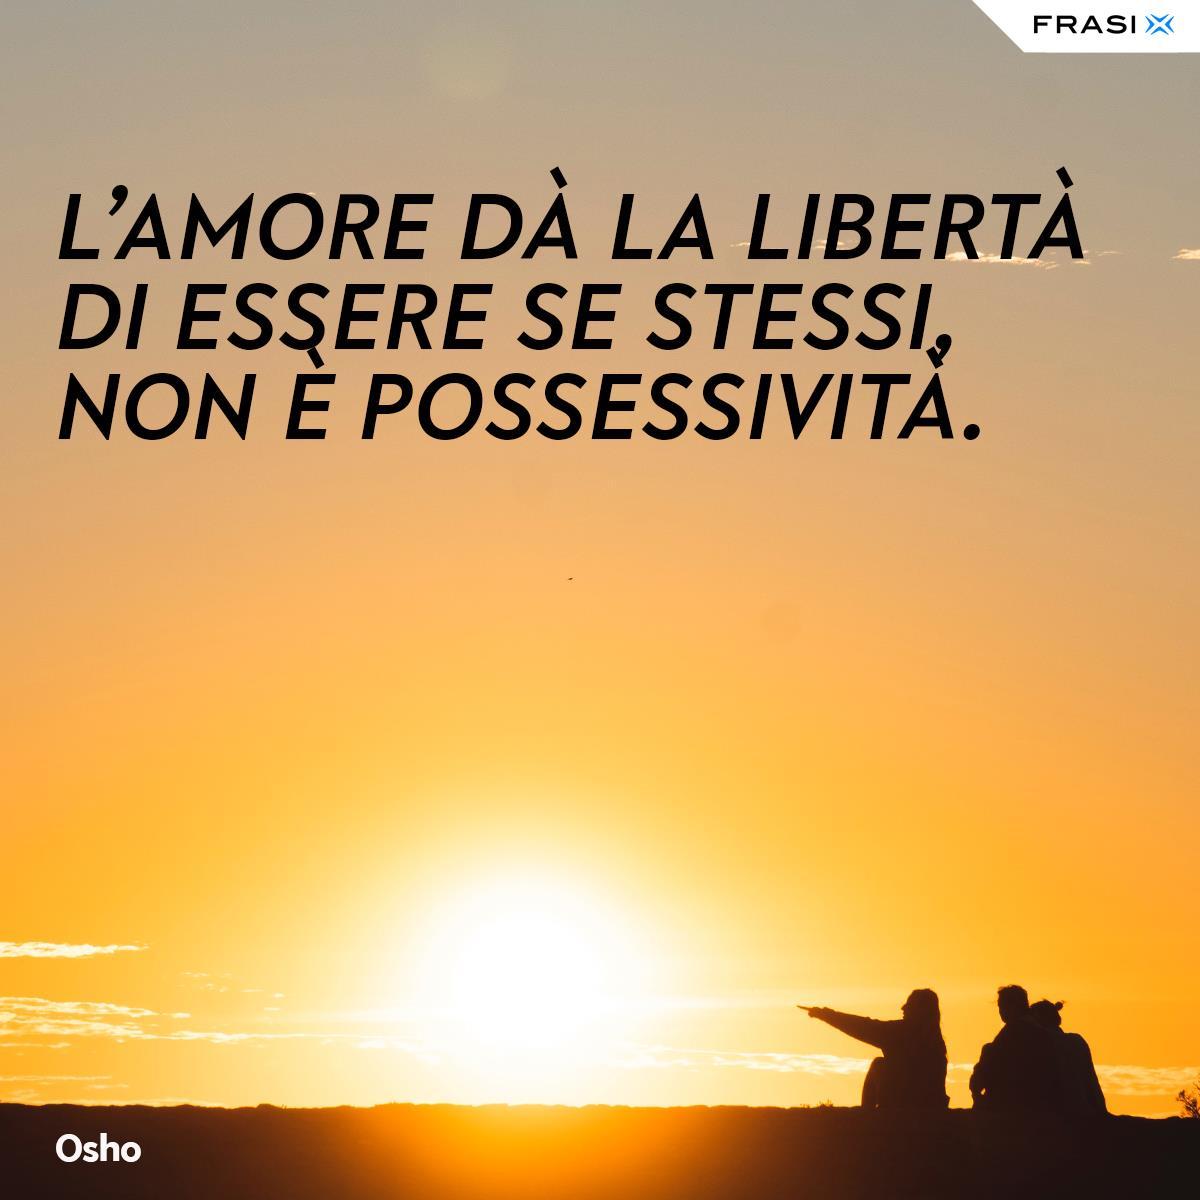 Frasi sulla libertà e amore Osho